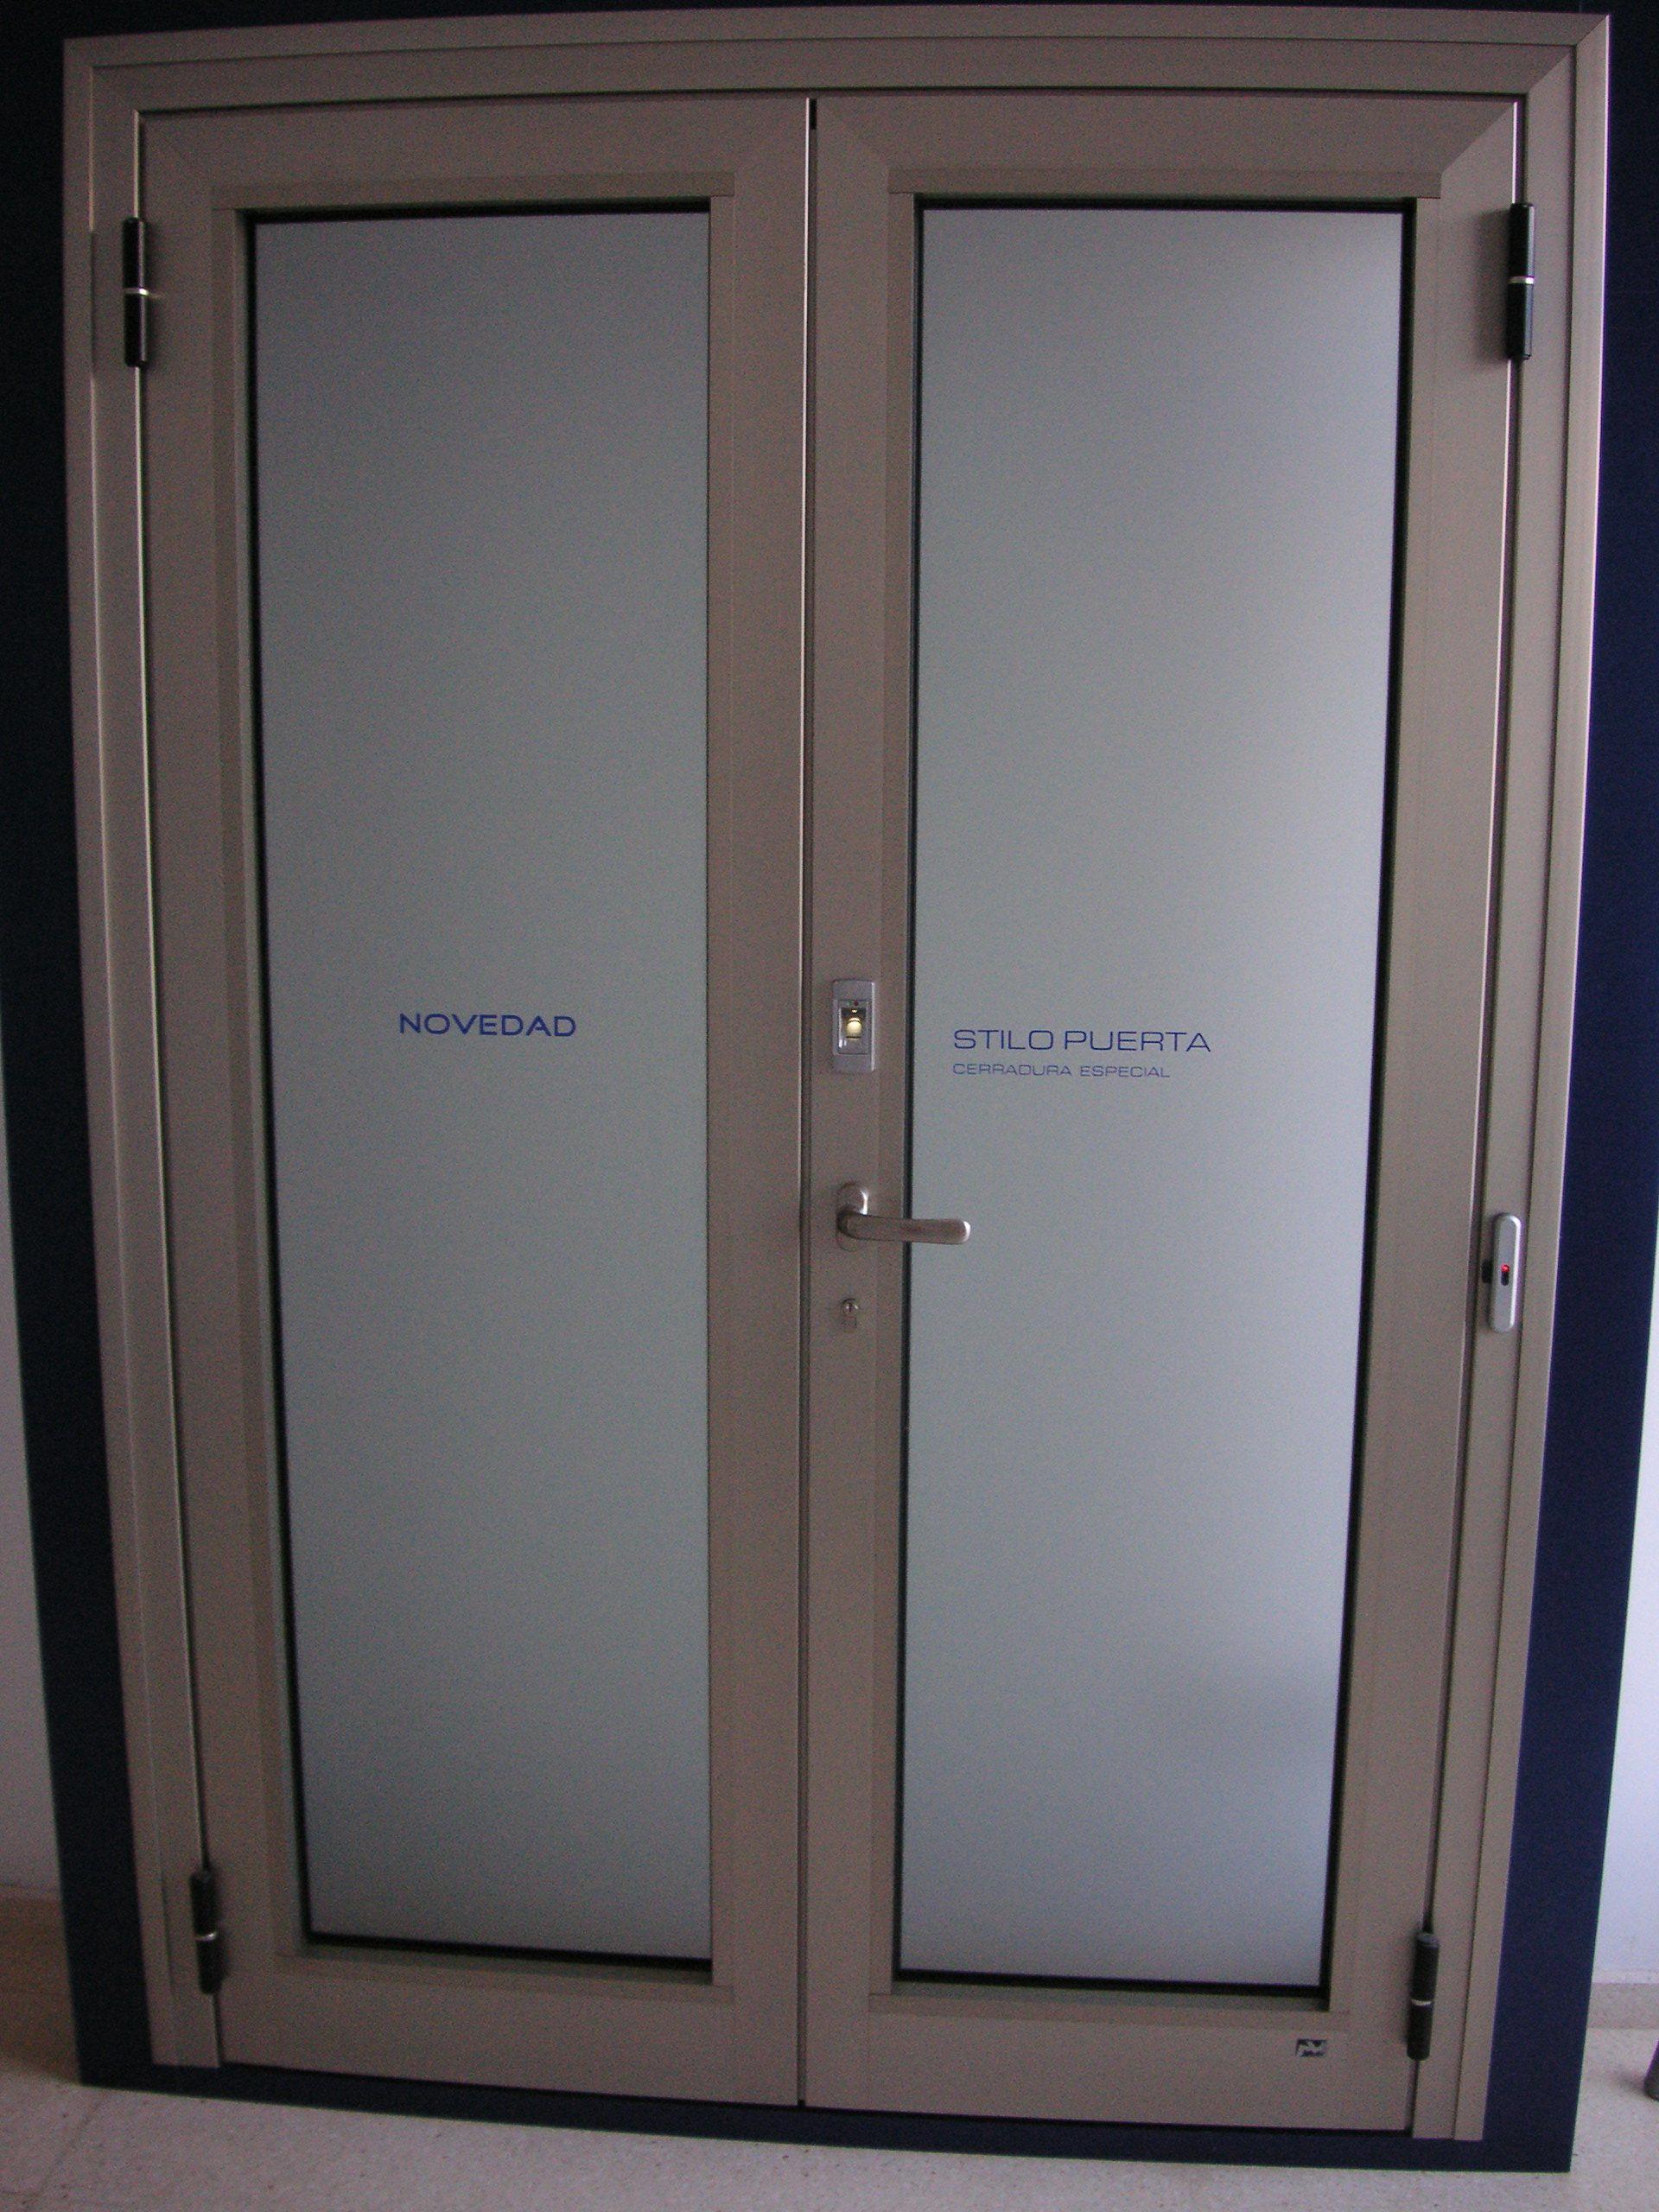 Mi casa decoracion catalogo de ventanas de aluminio for Catalogo de puertas de aluminio